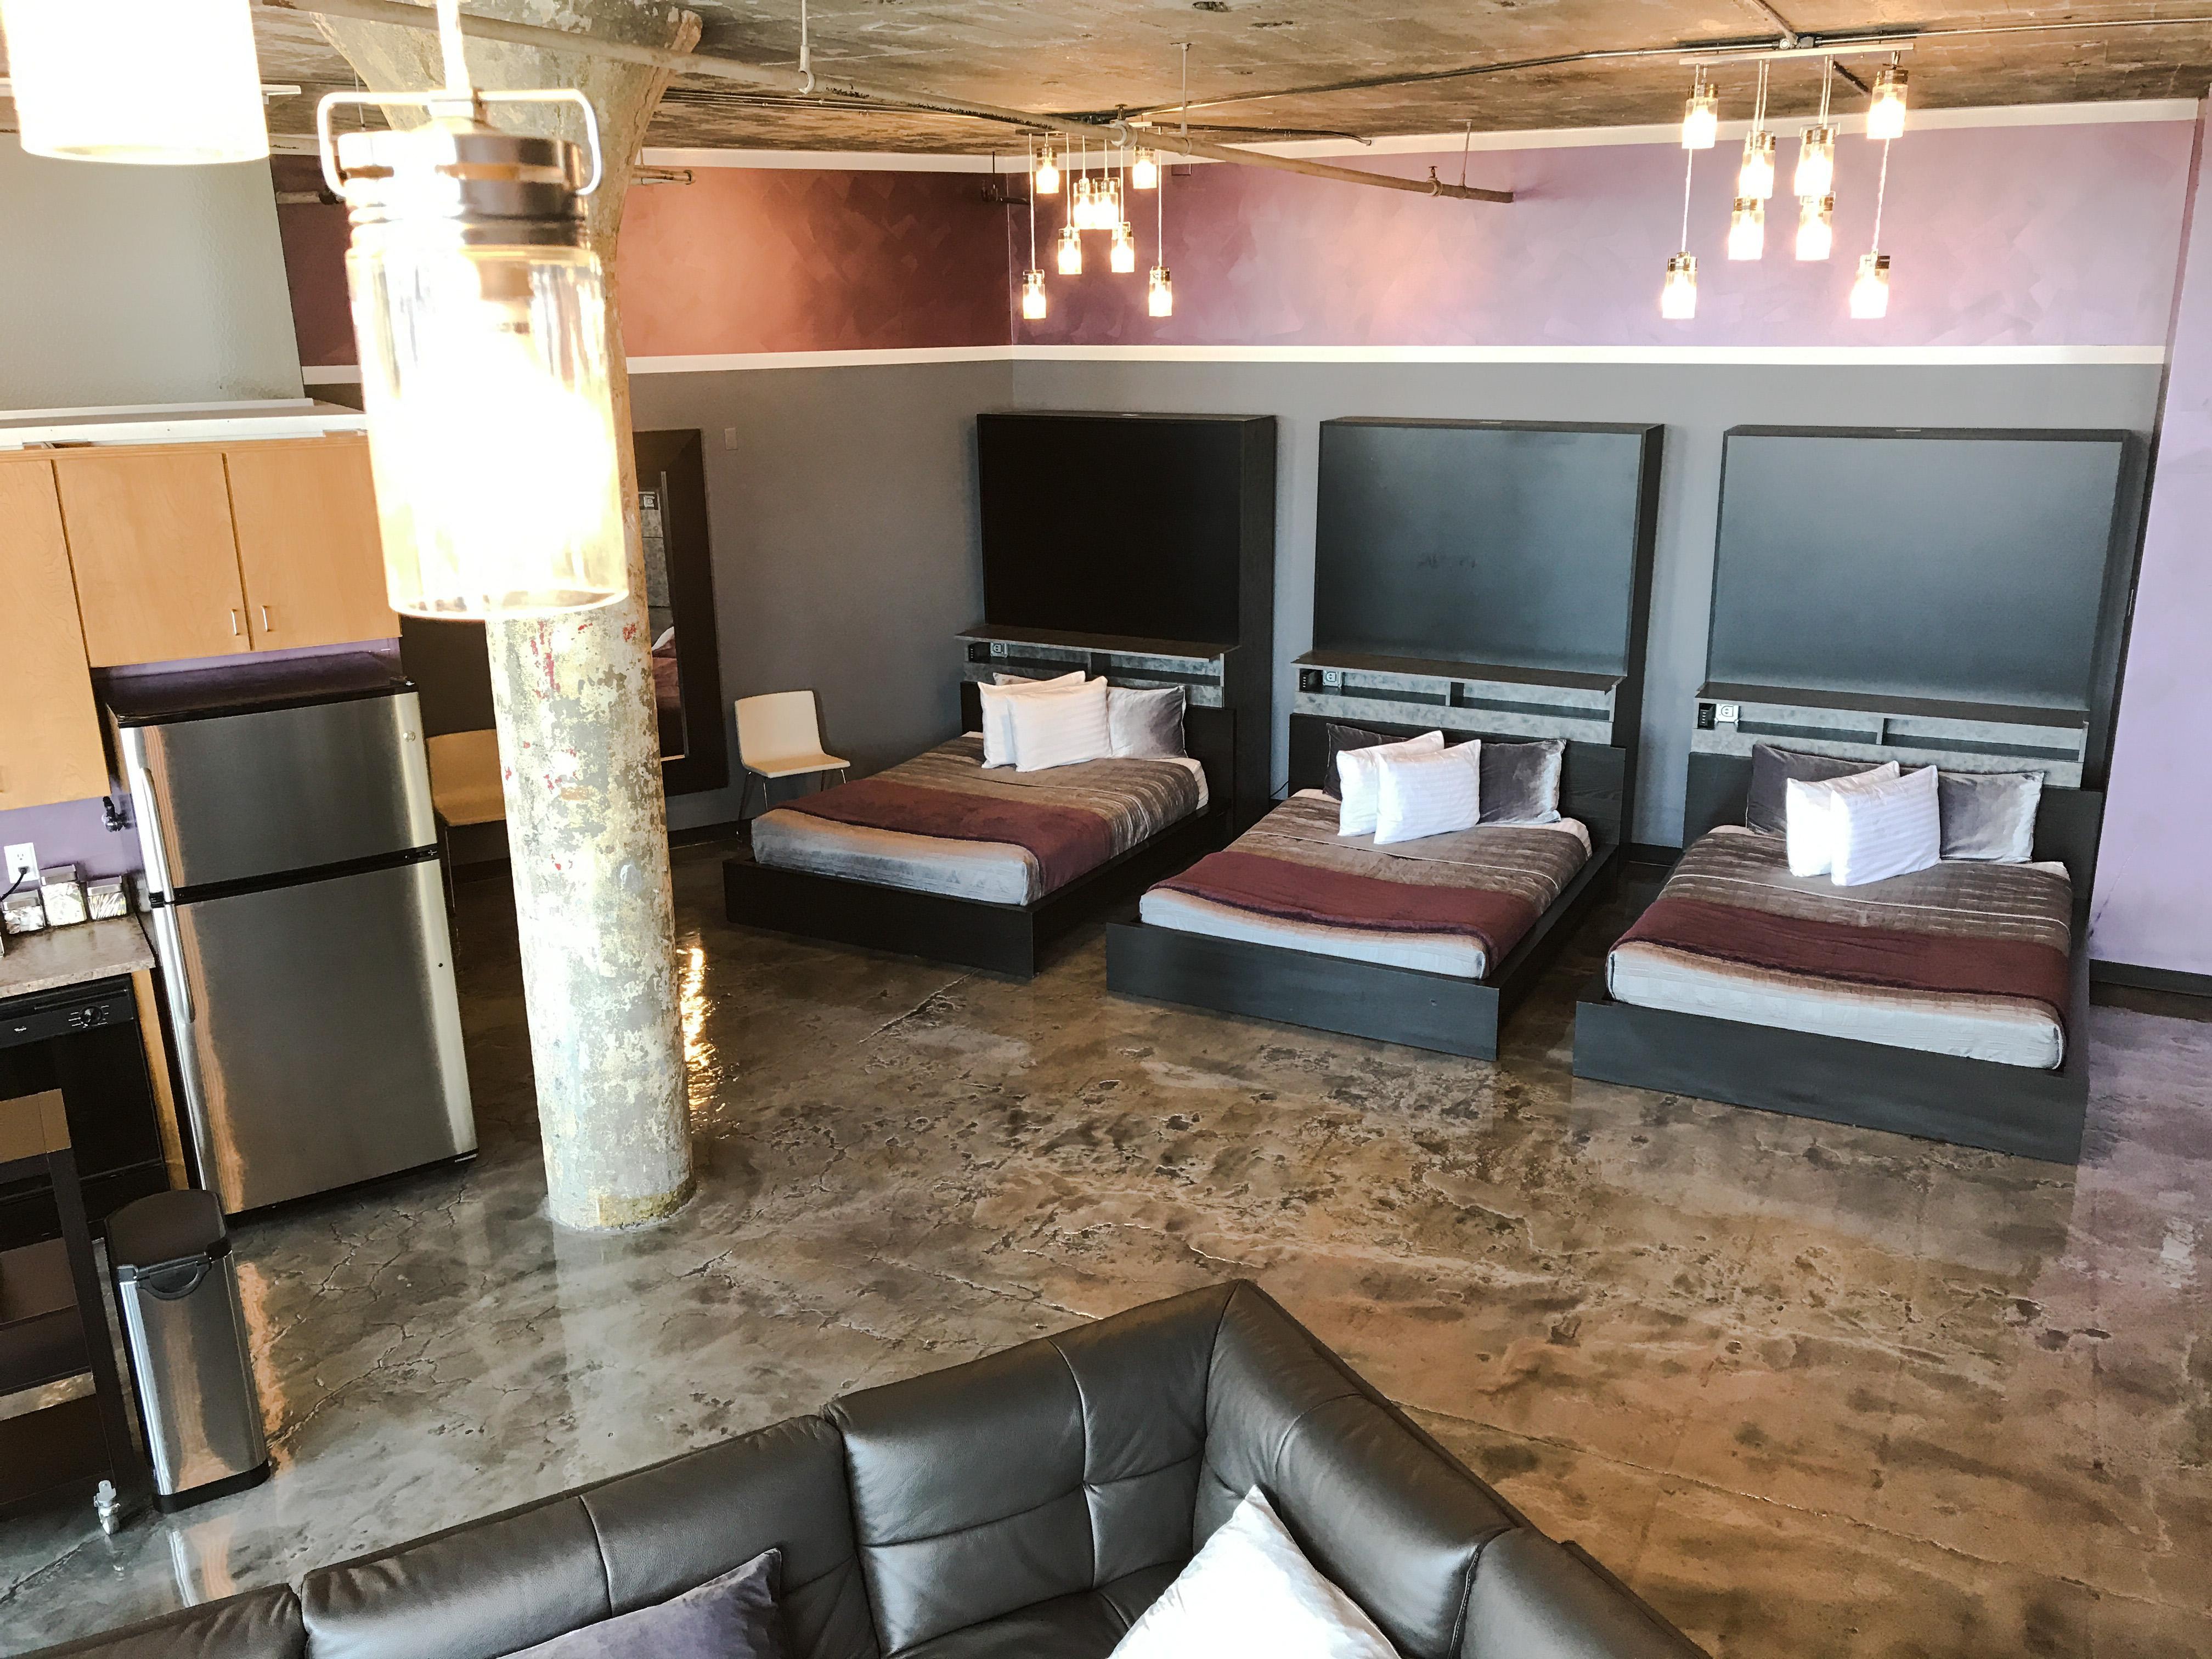 Loft Reverie Hotel 704 - Beds + Queen Sized Zbeds + Electronic Murphy Beds + Memory Foam Matress